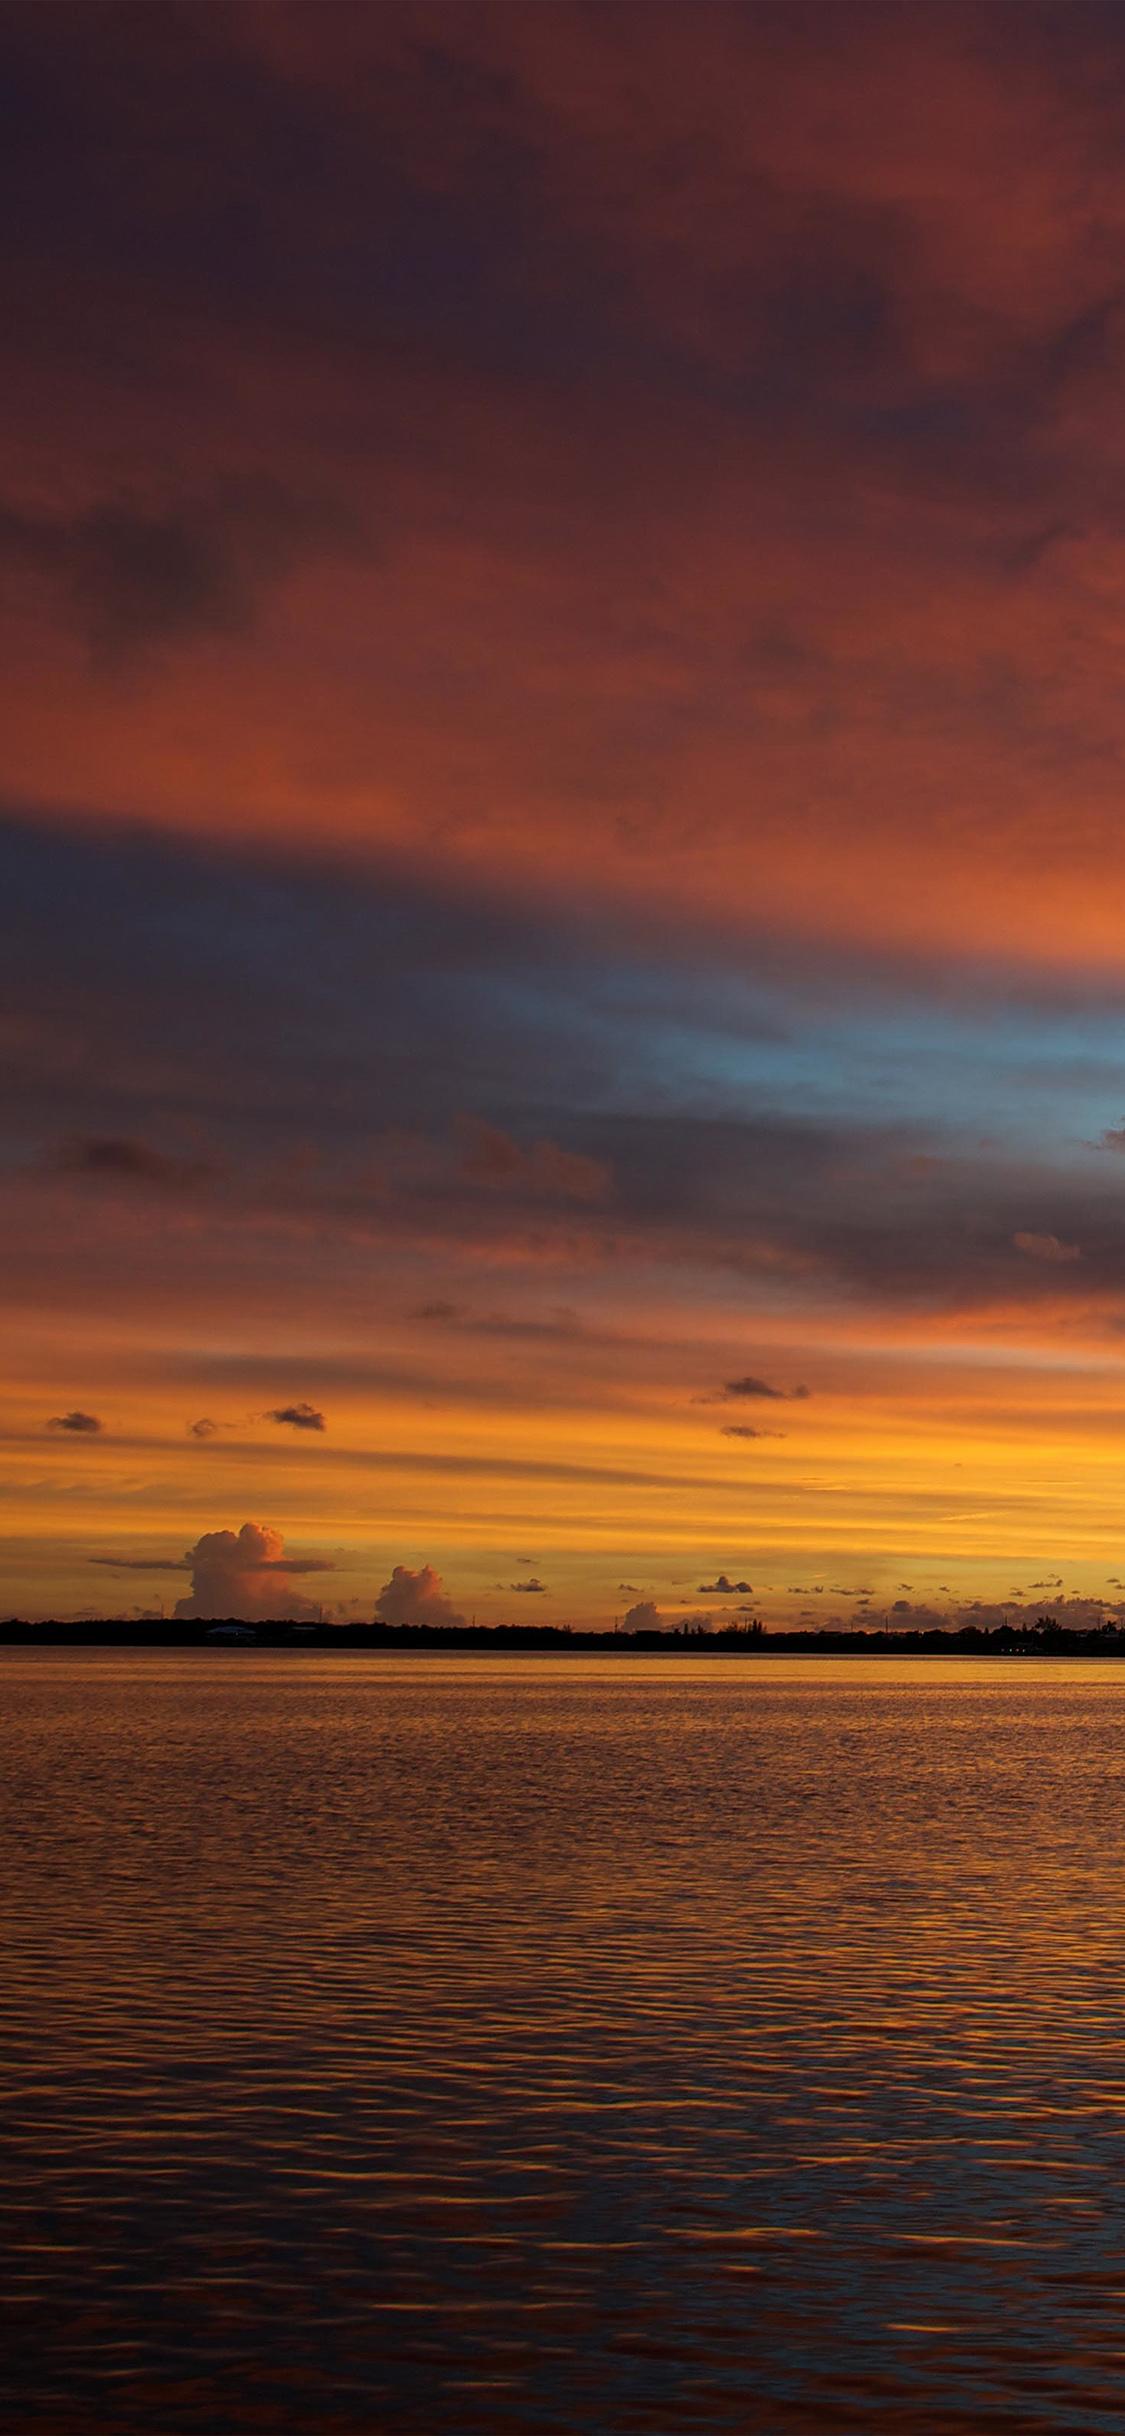 Batman Wallpaper Iphone X Nc91 Sea Port Night Sunset Summer Wallpaper